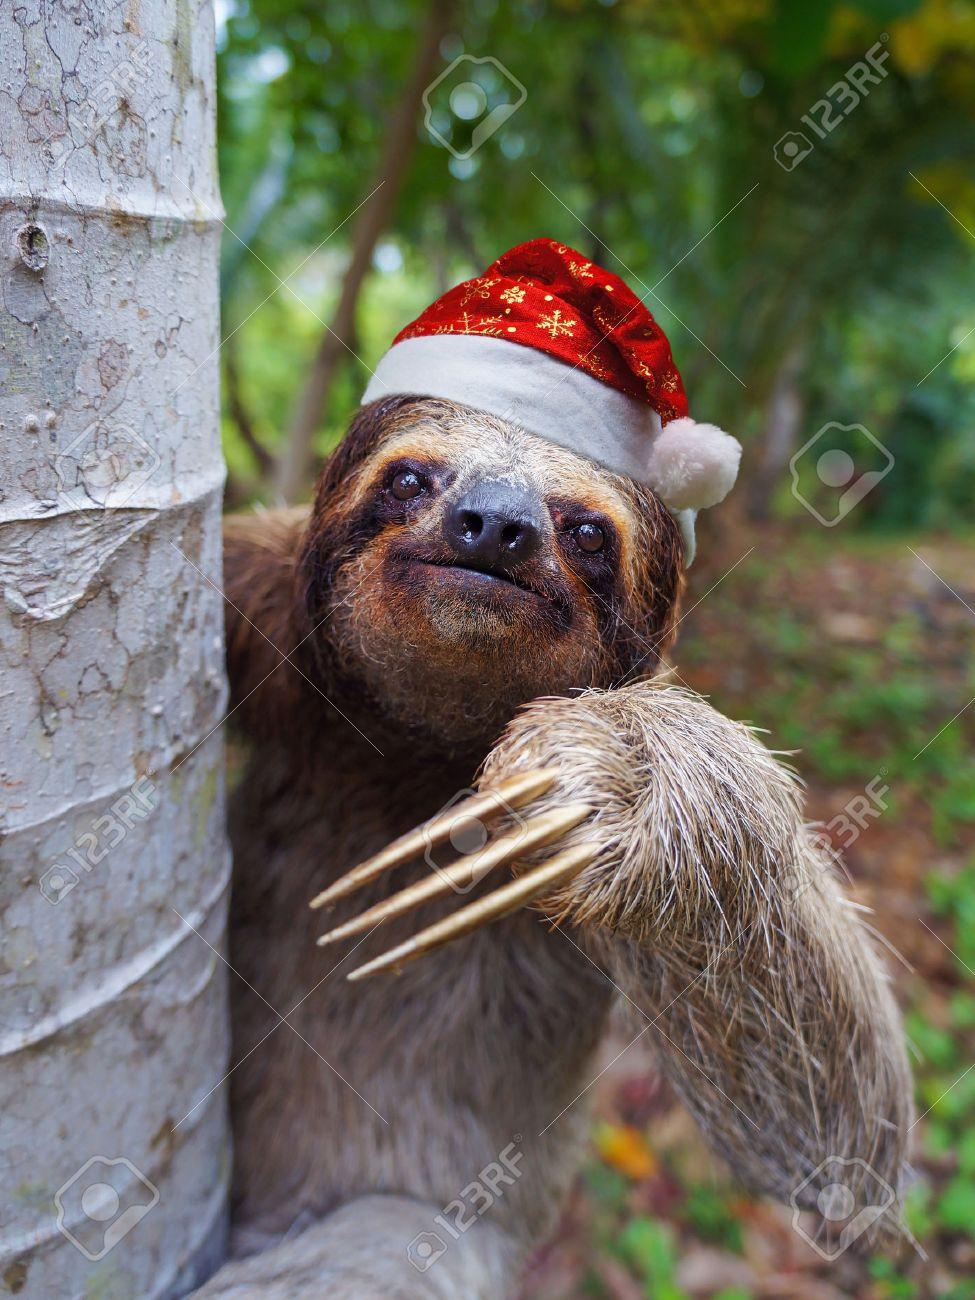 Christmas Sloth.Christmas Animal Portrait Of A Sloth Wearing A Santa Hat